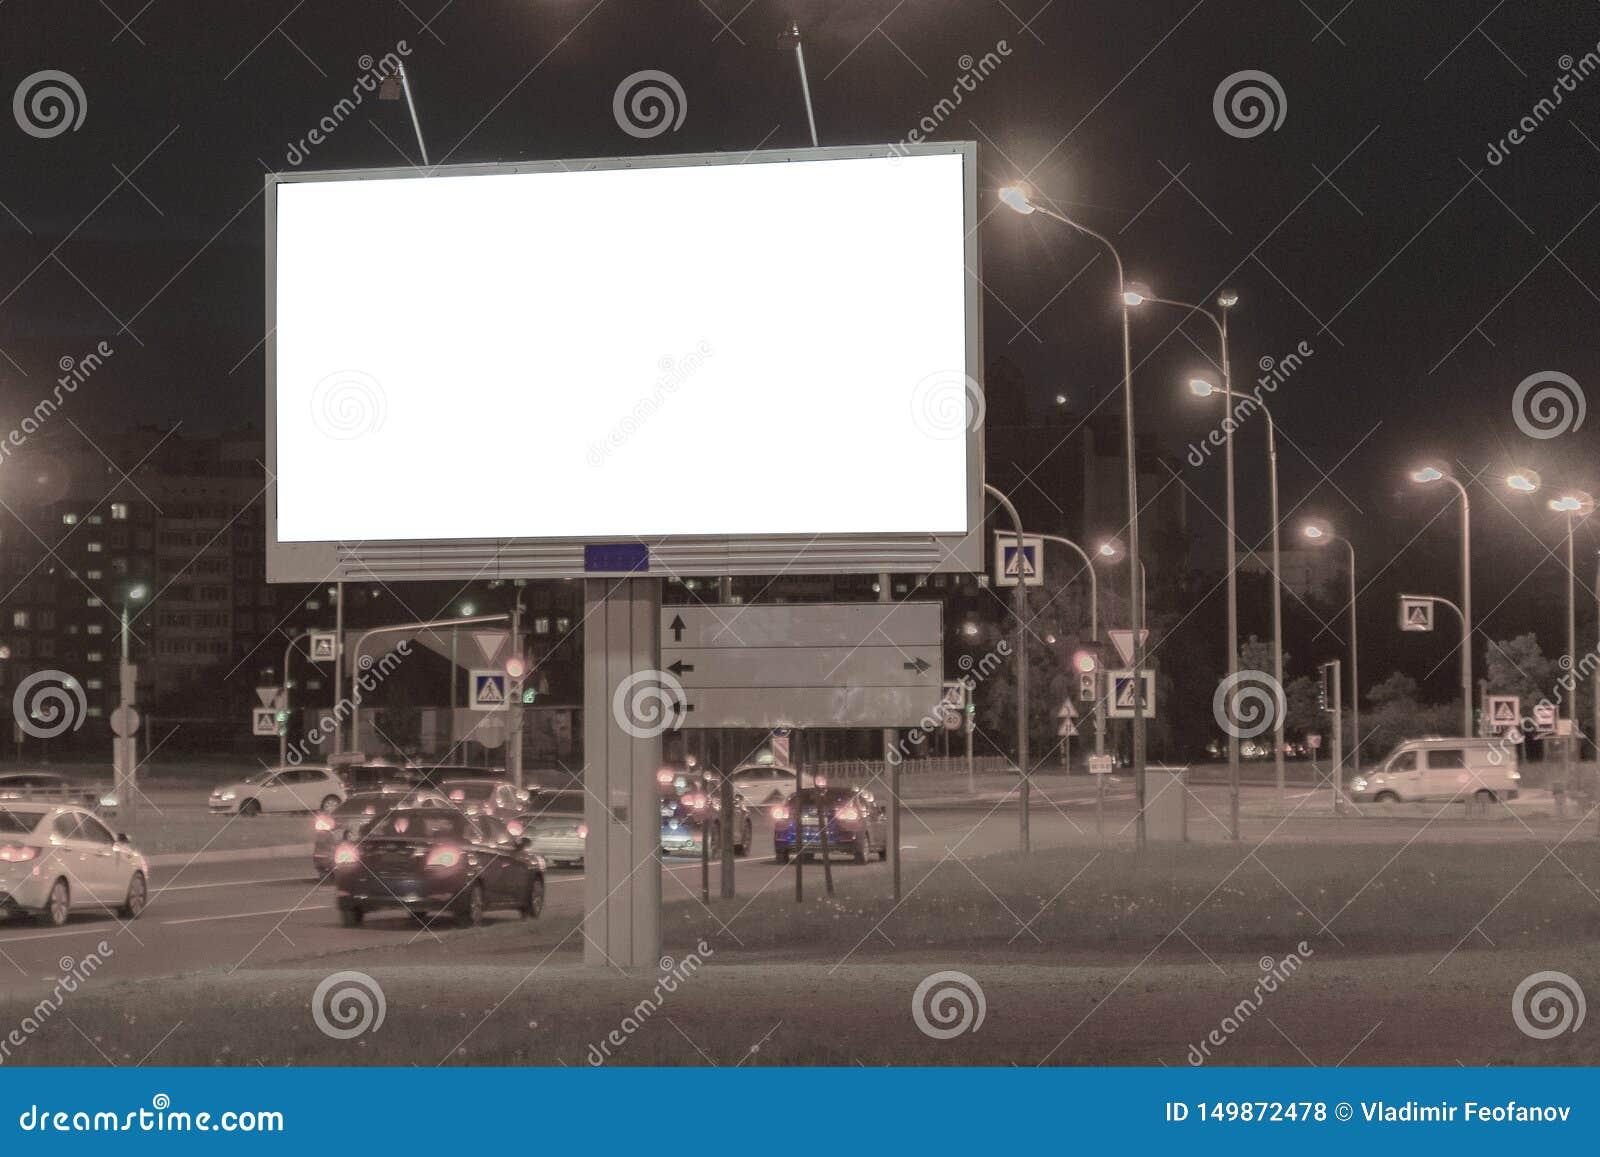 Quadro de avisos na cidade da noite na borda da rua anunciar